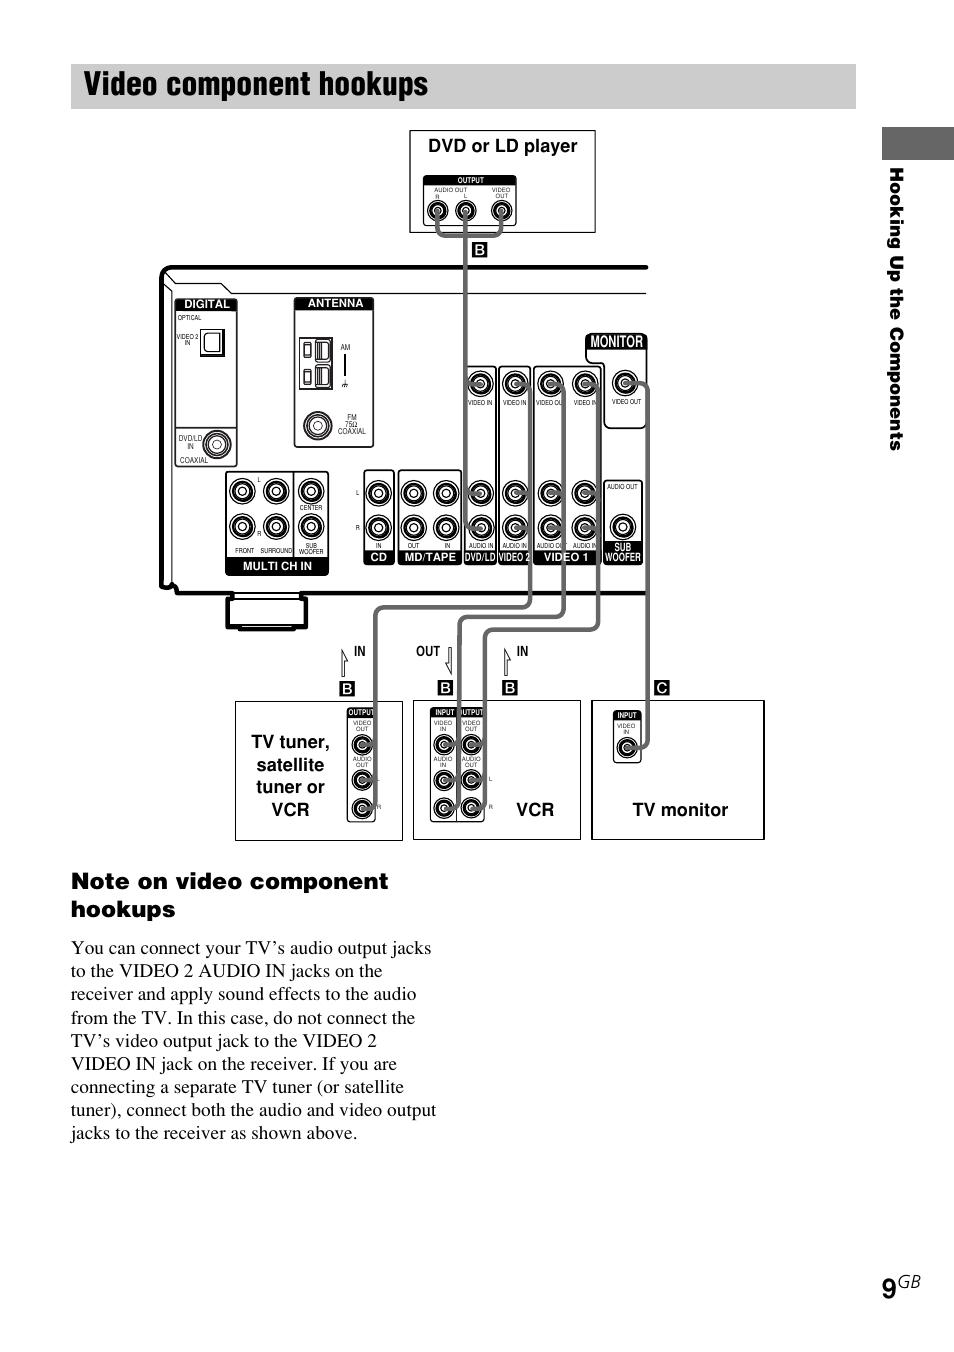 video component hookups hooking up the components tv monitor dvd rh manualsdir com sony str-k740p manual download sony receiver str-k740p manual